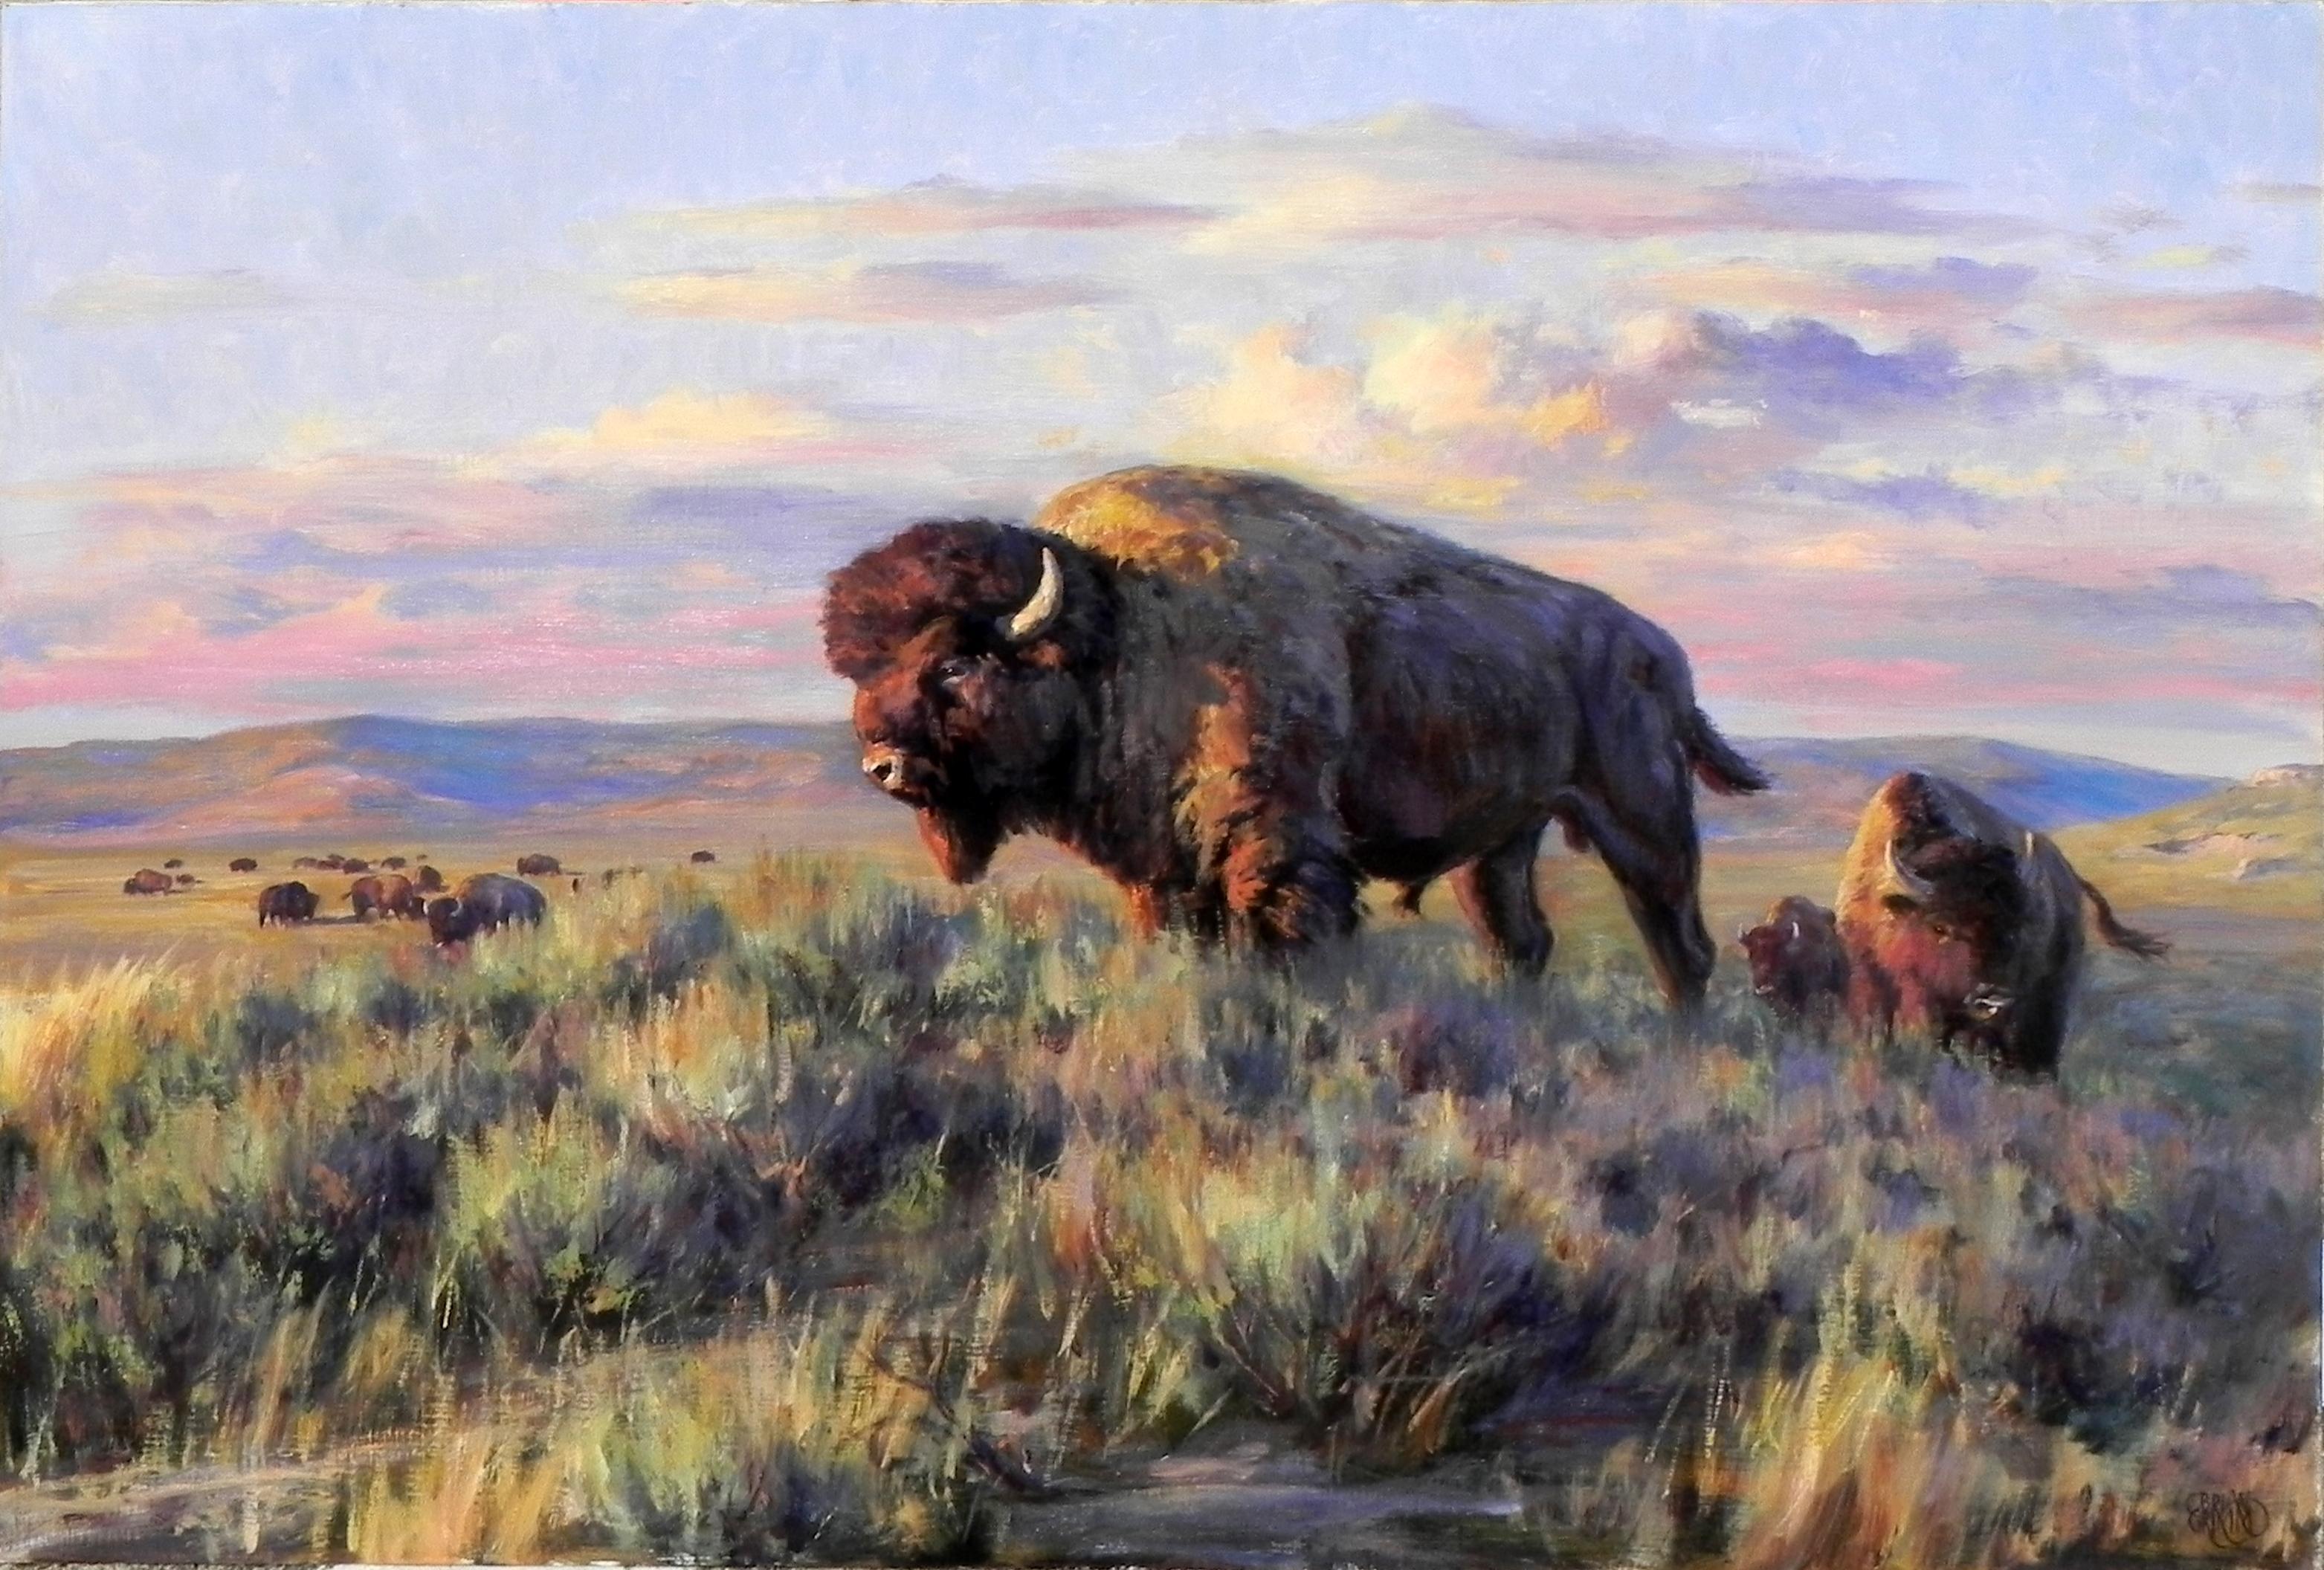 """Looking West"", Brian Grimm, Oil on Canvas, 30x40 in, Buffalo, Western Landscape"